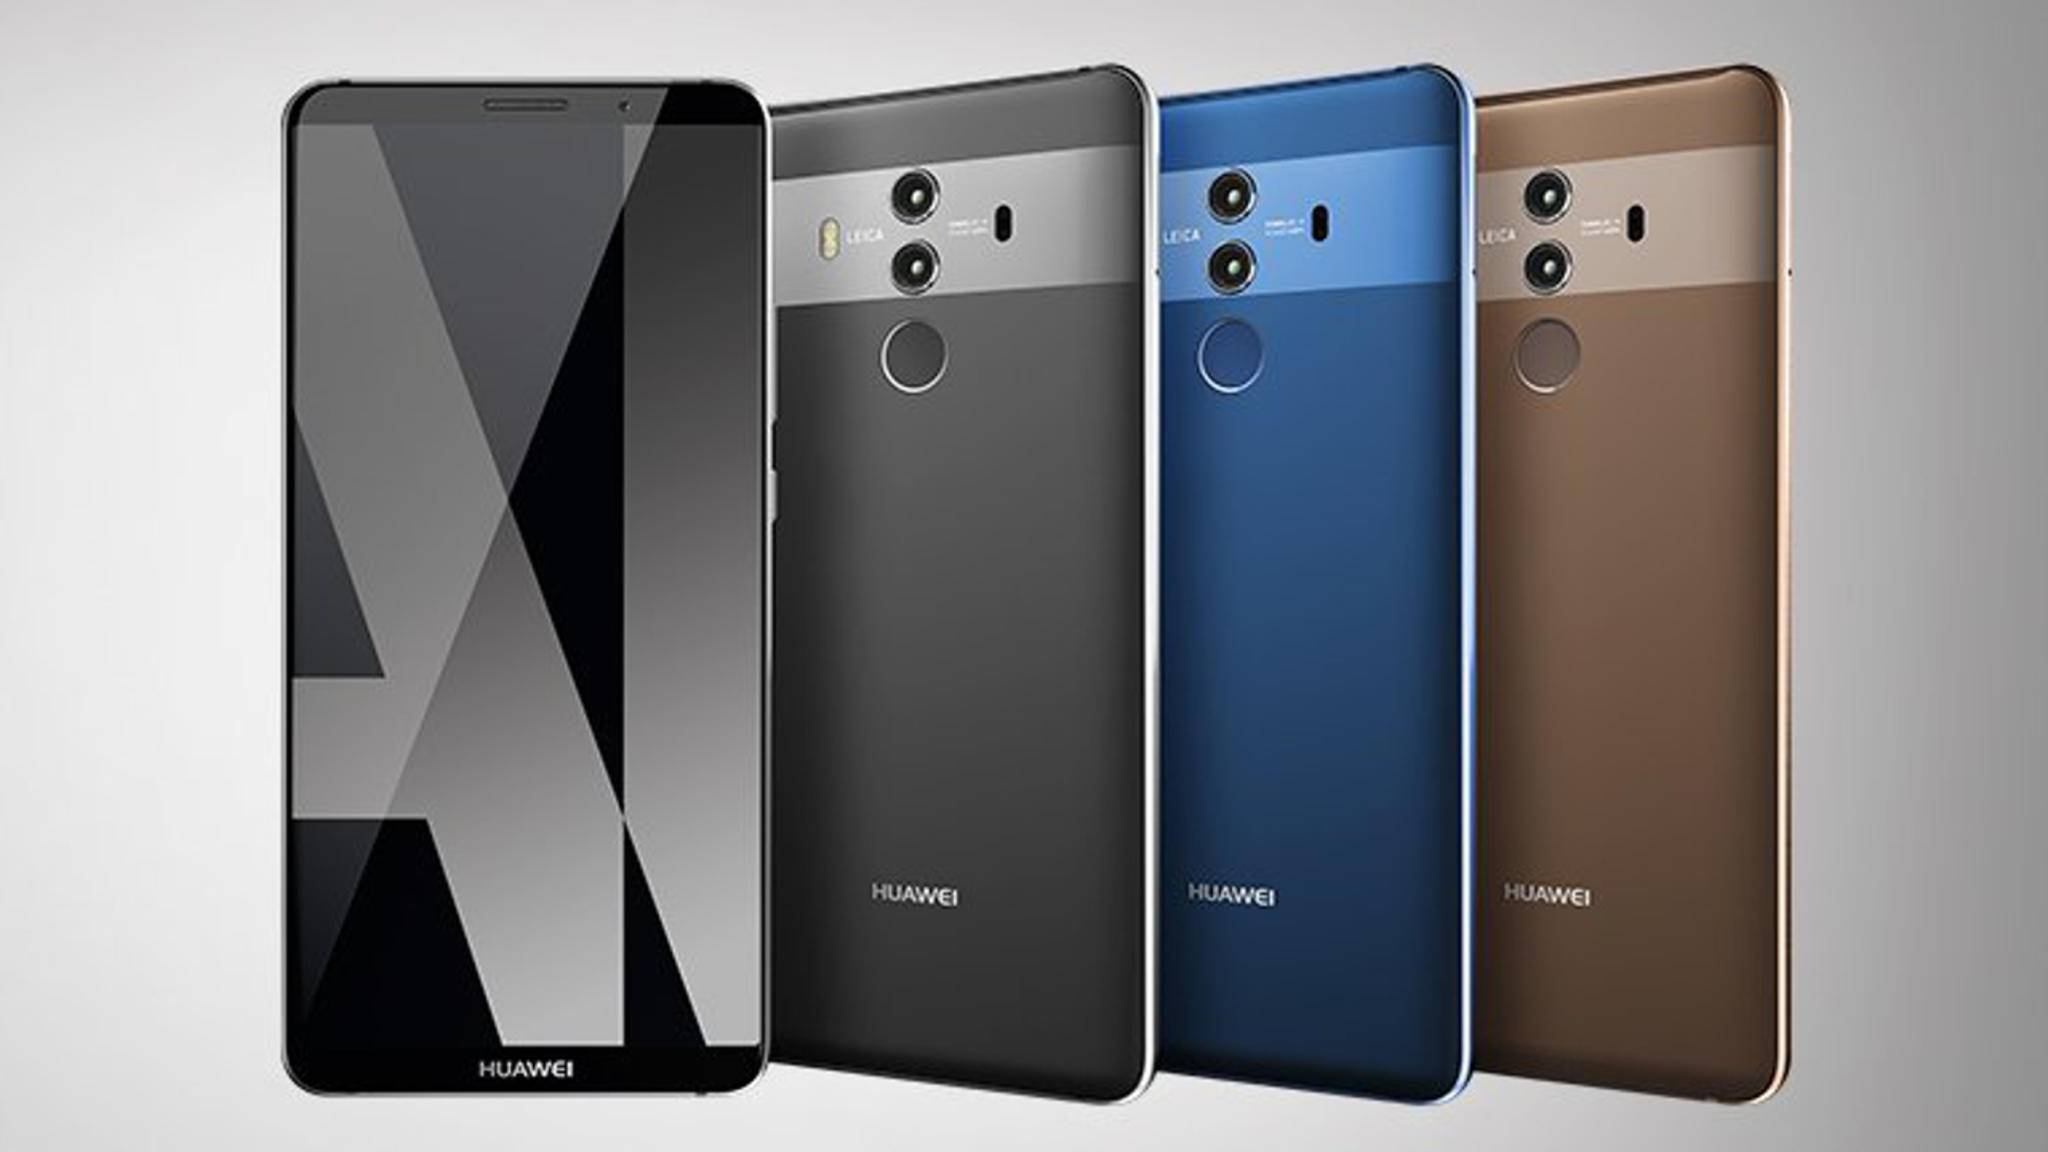 Das Huawei Mate 10 Pro soll eine nie dagewesene KI bieten.